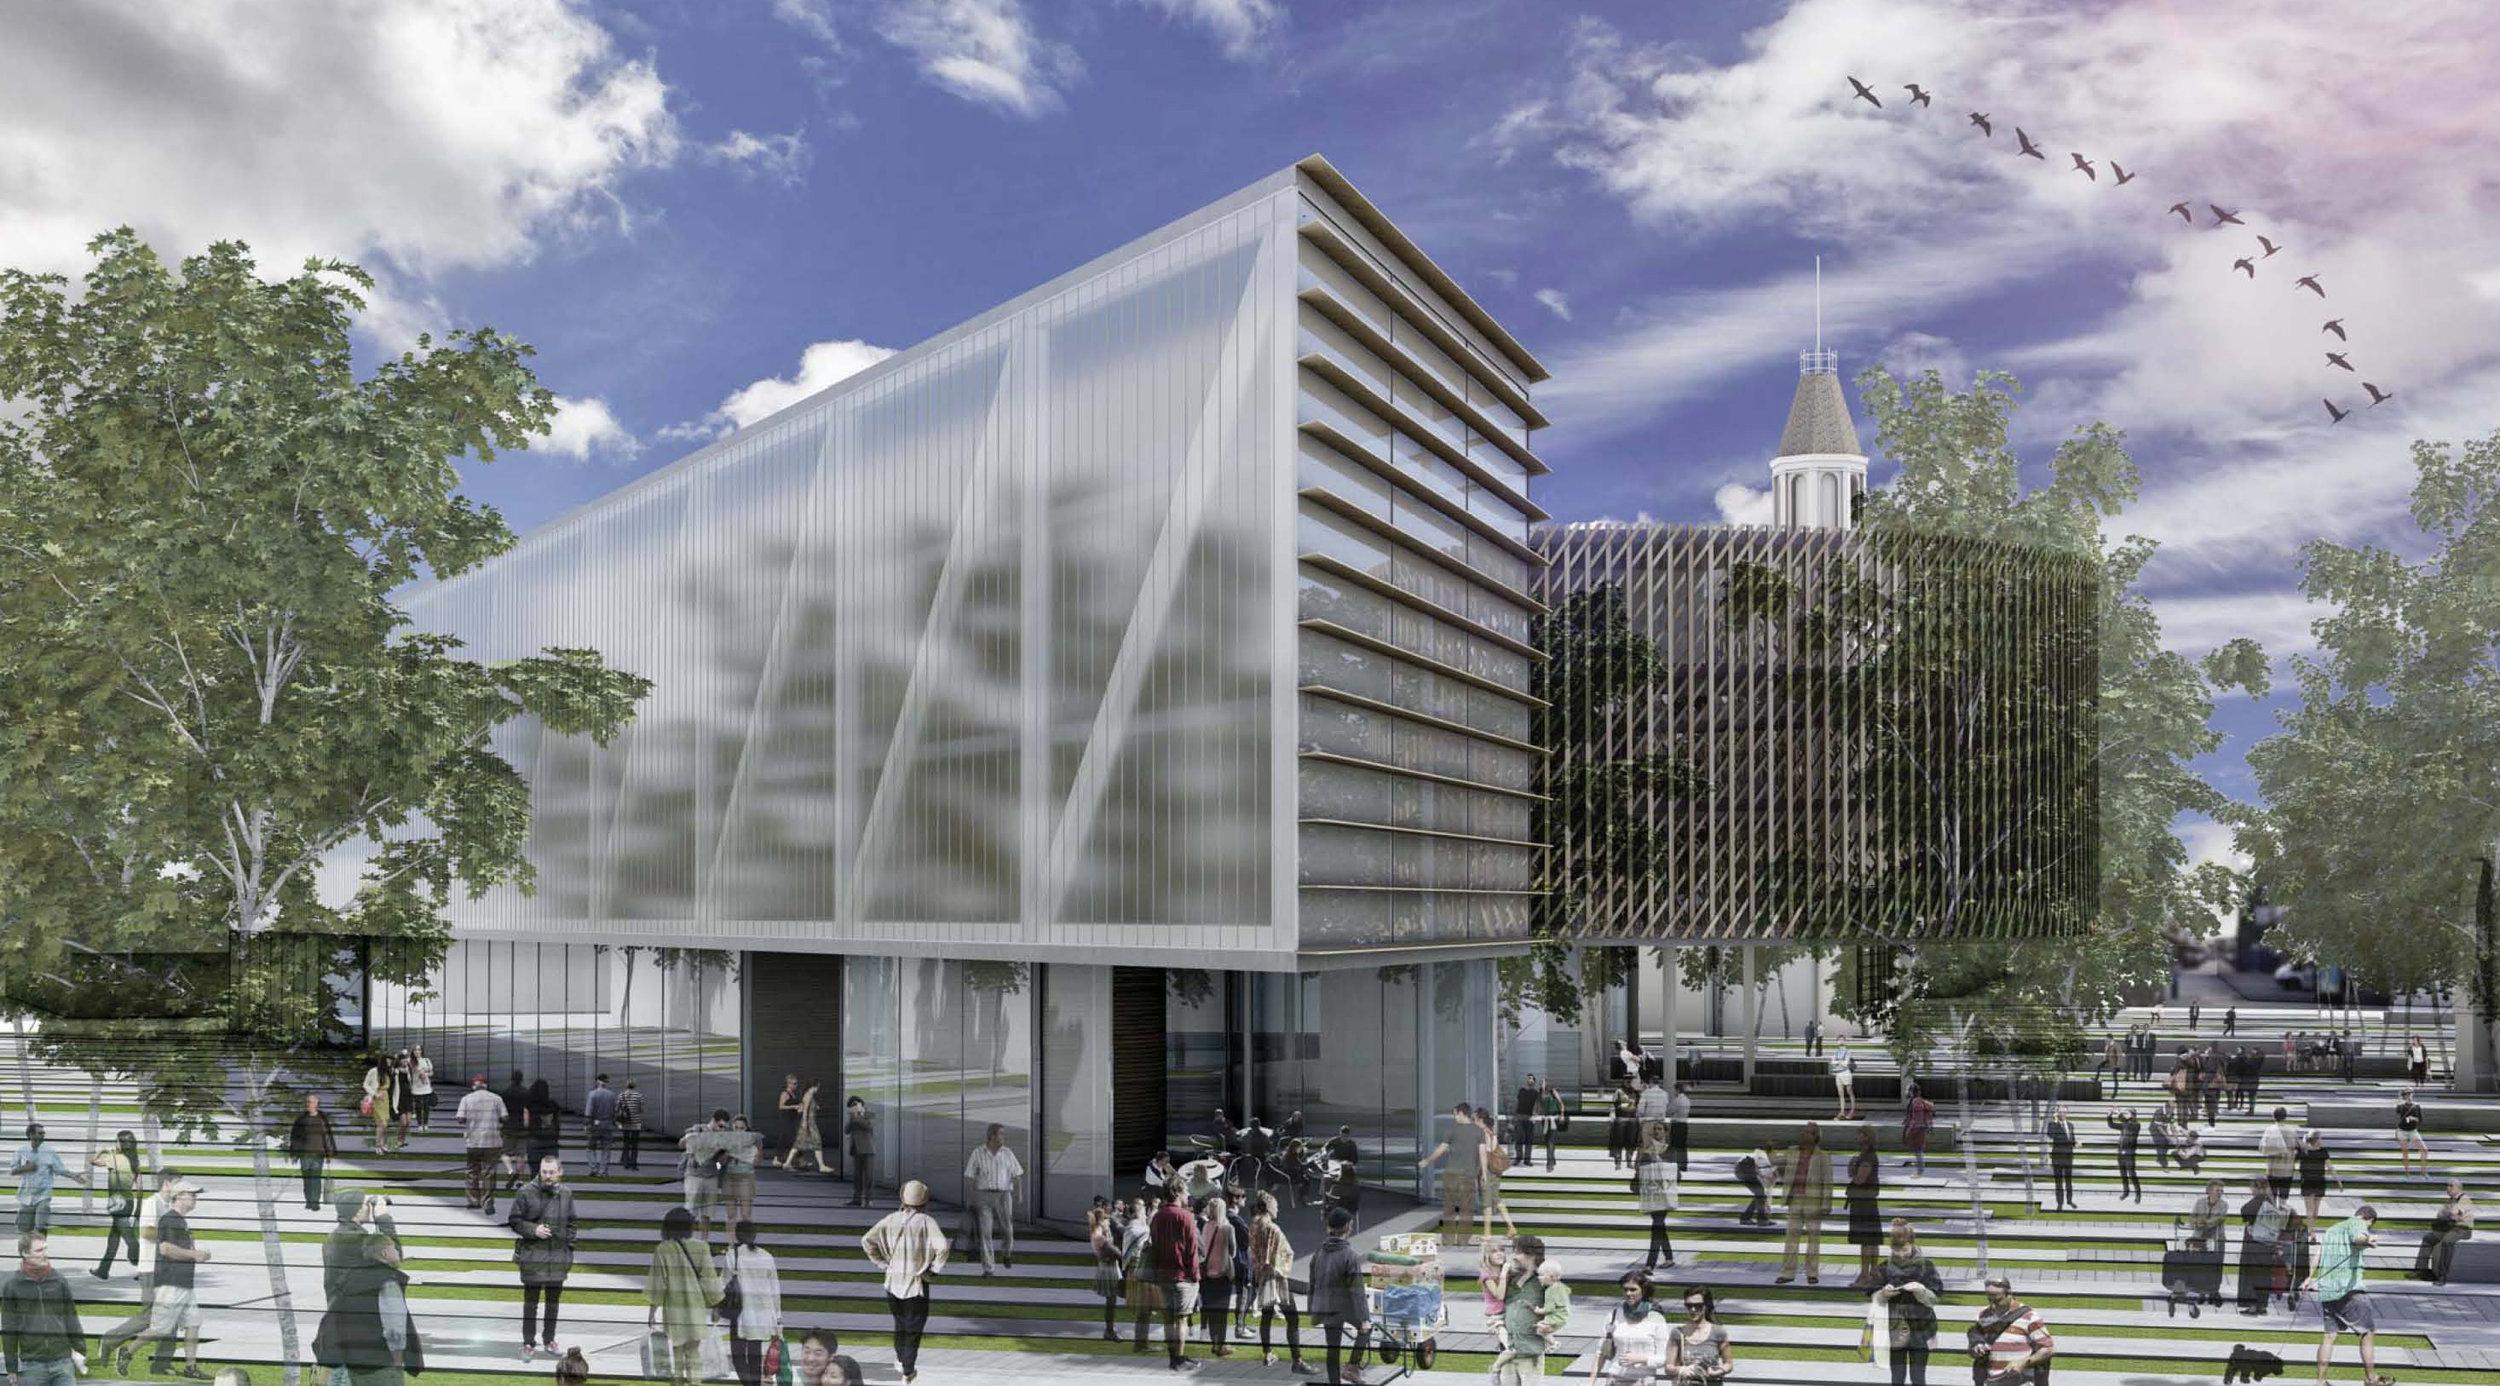 Lee Syminton City of Fremantle Kings Square